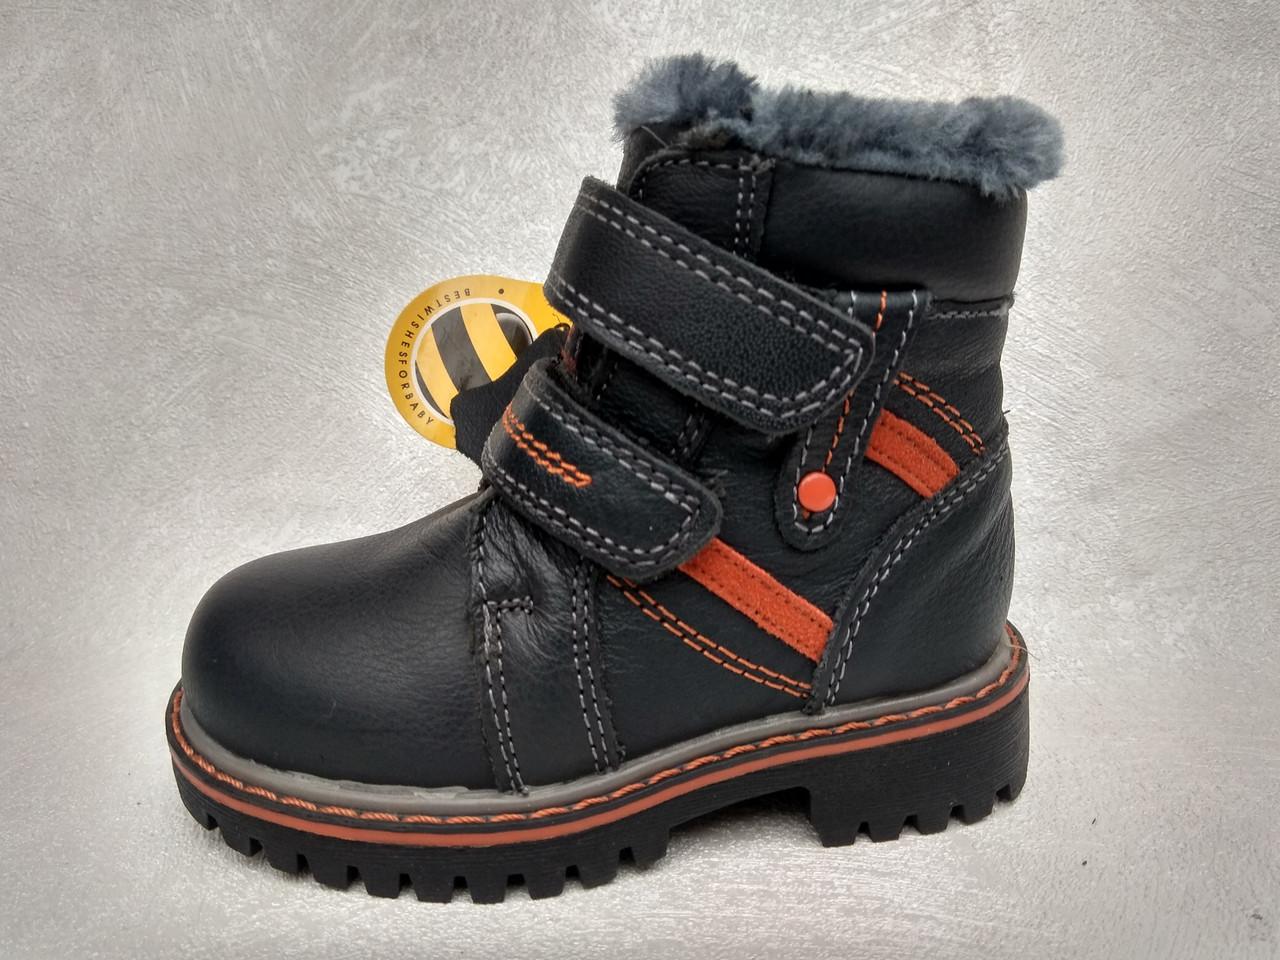 2012cff80fe993 Зимние ботинки для мальчиков Clibee (р.21-26), цена 333,58 грн ...